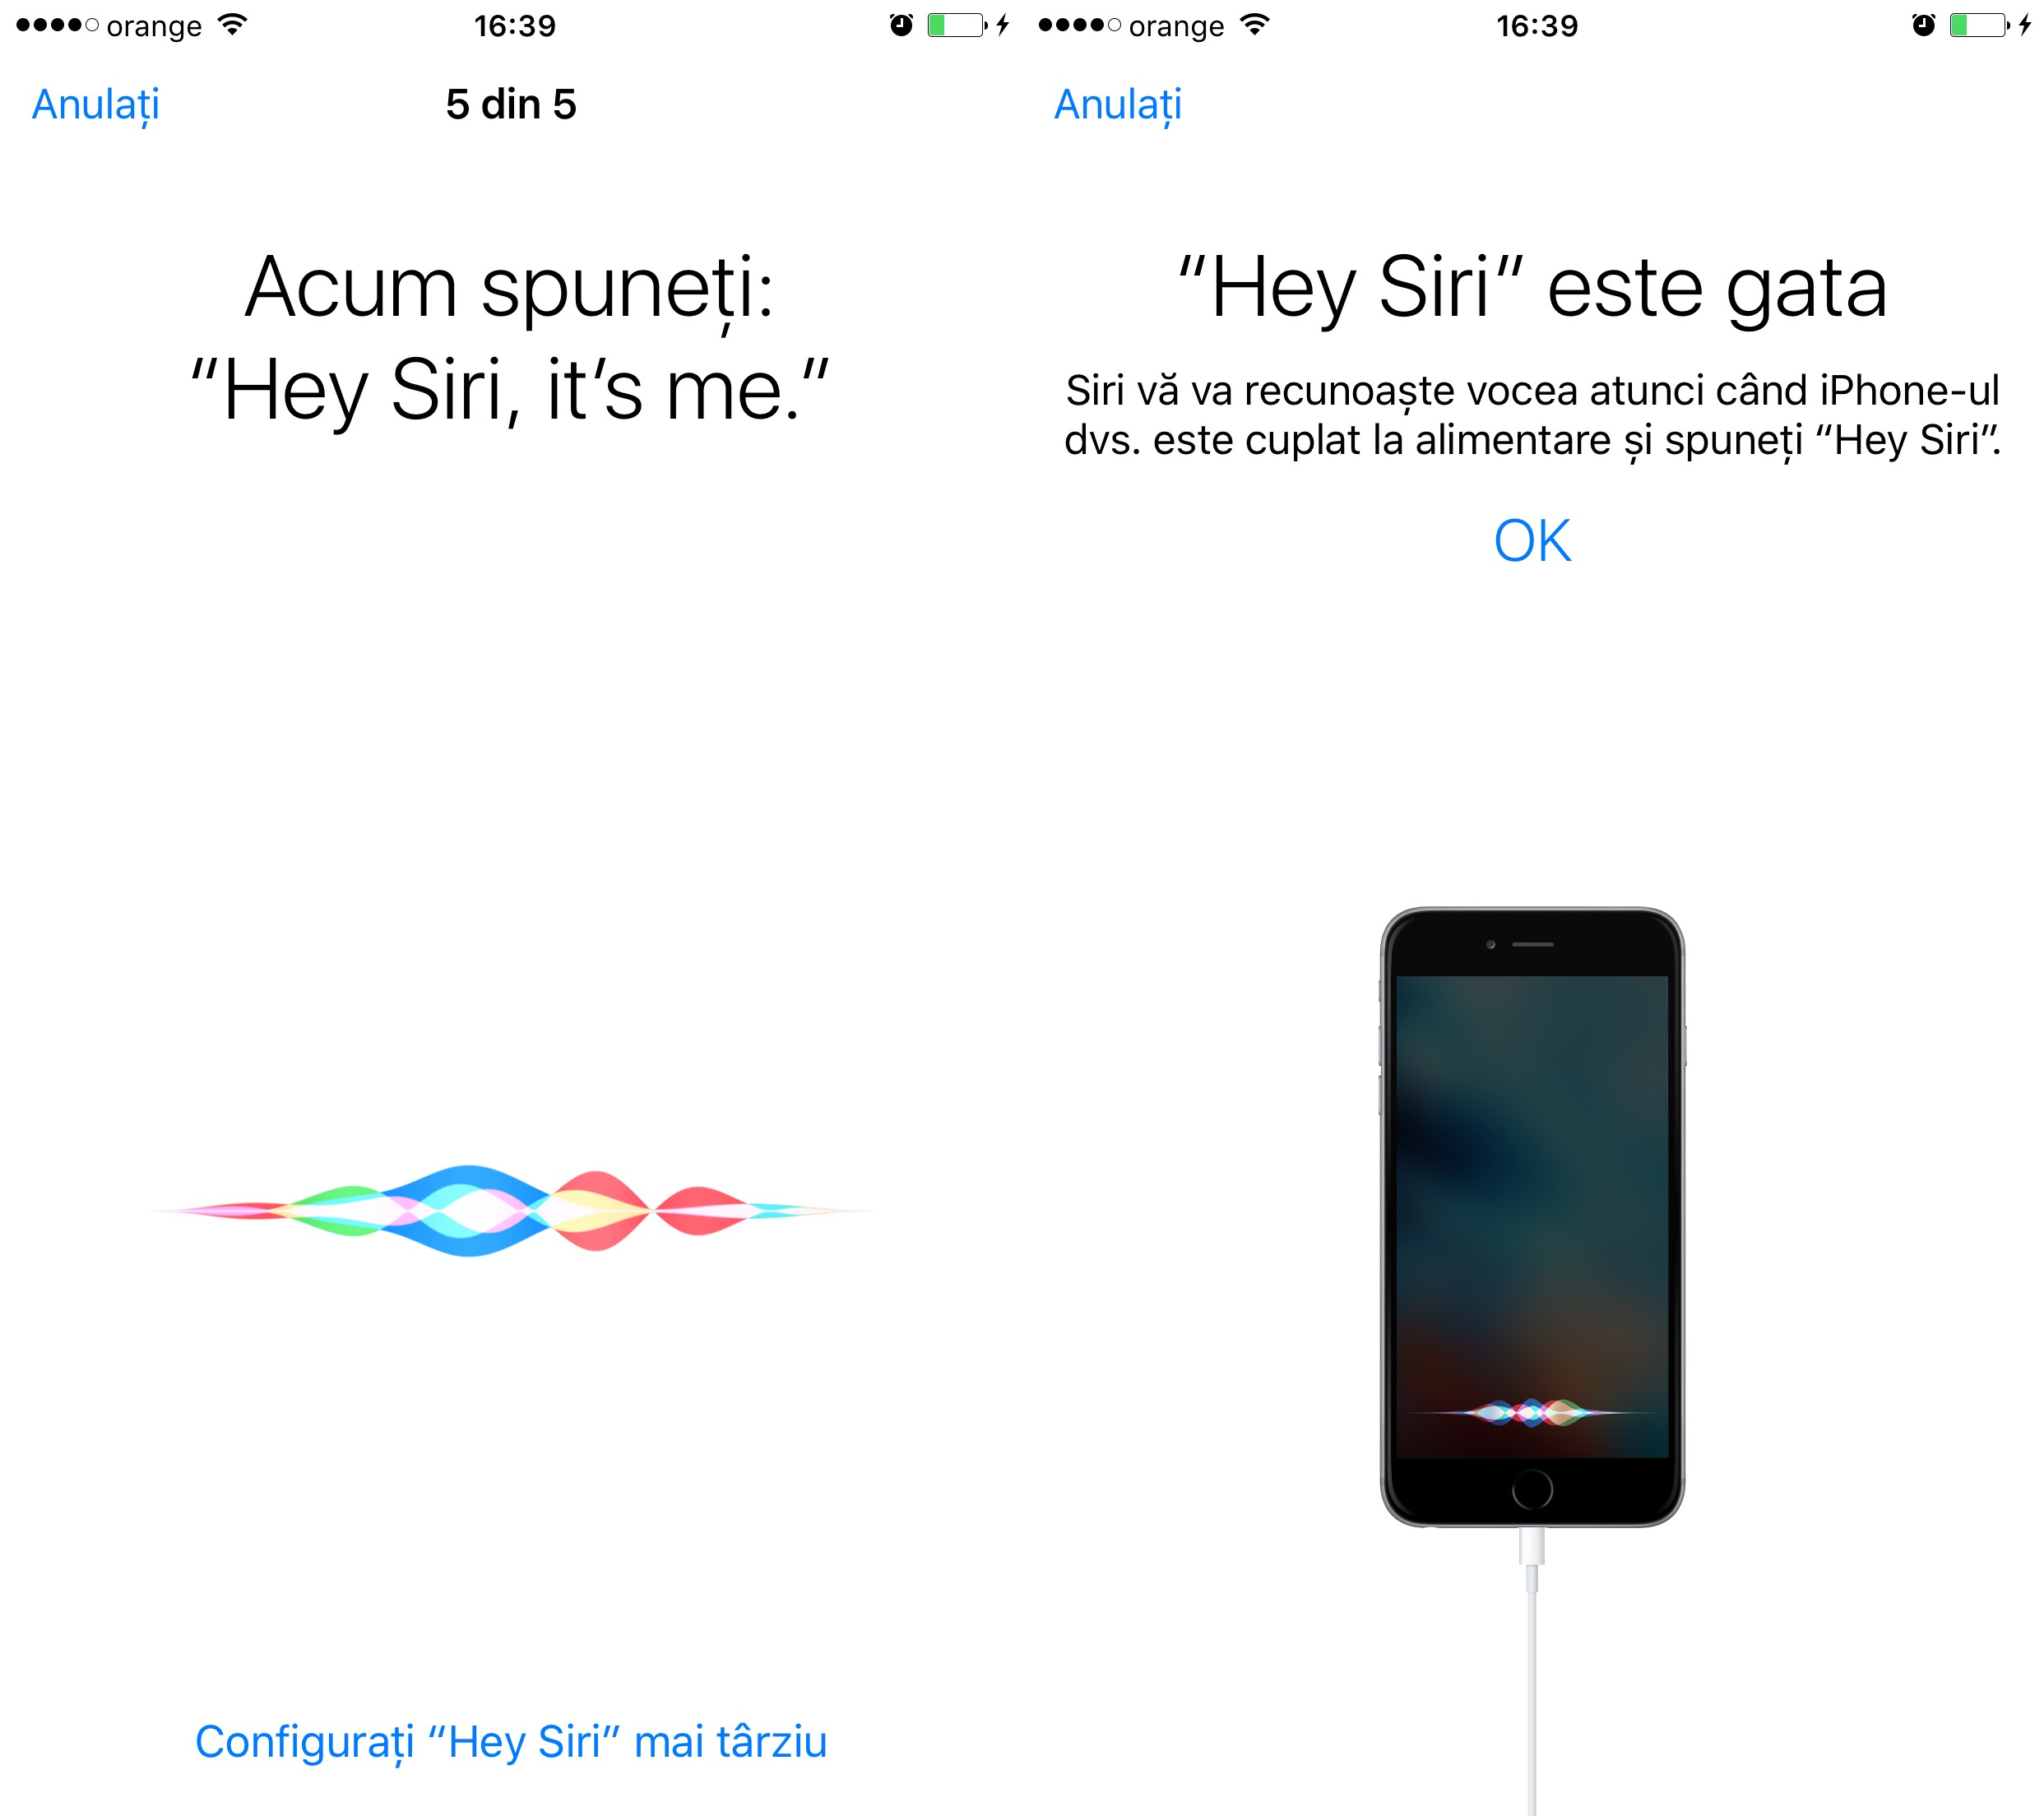 Configurare Hey Siri iOS 9 3